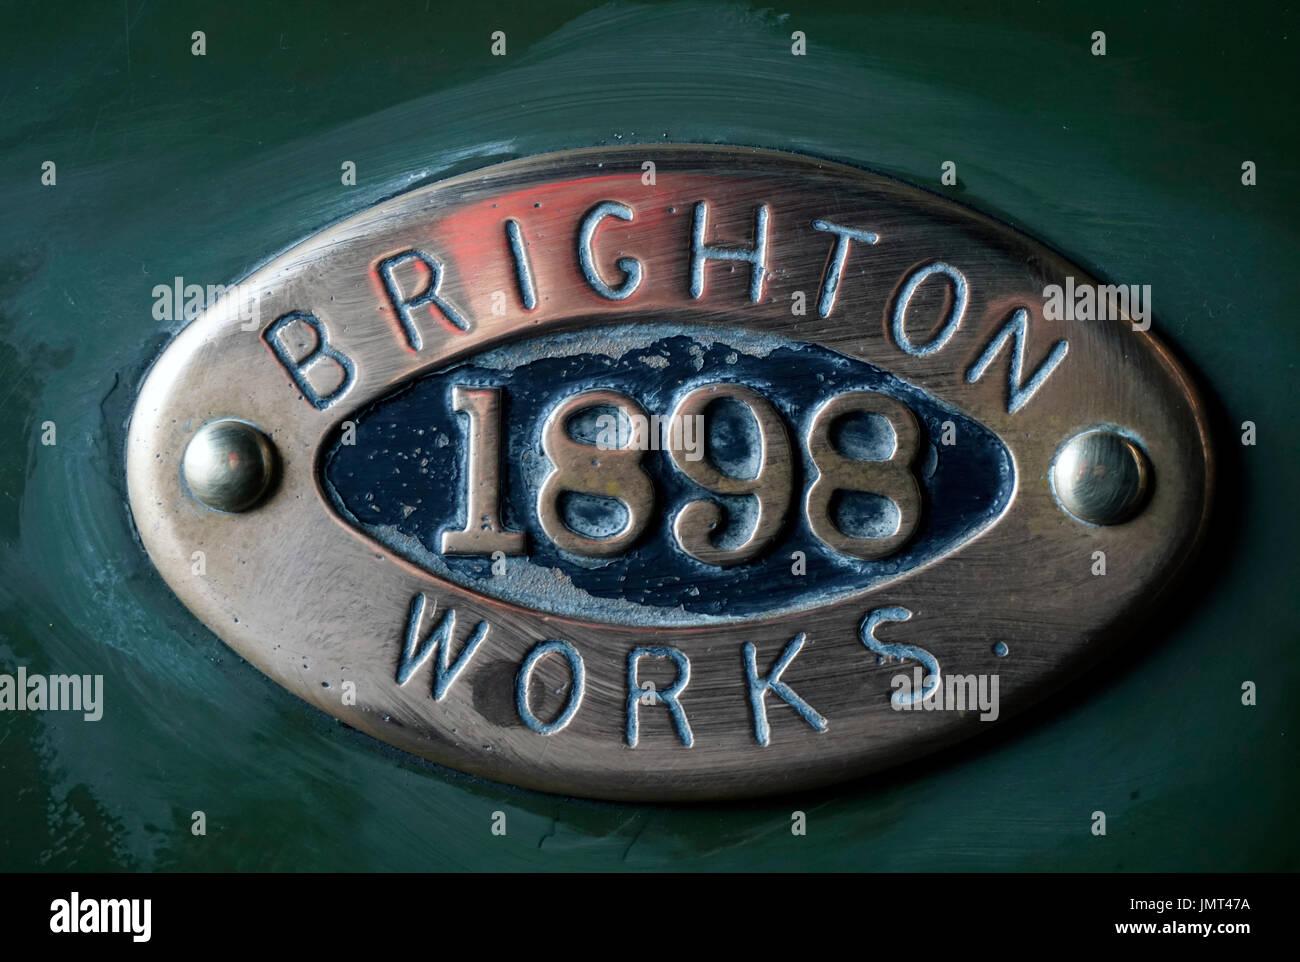 steam train date plate - Stock Image